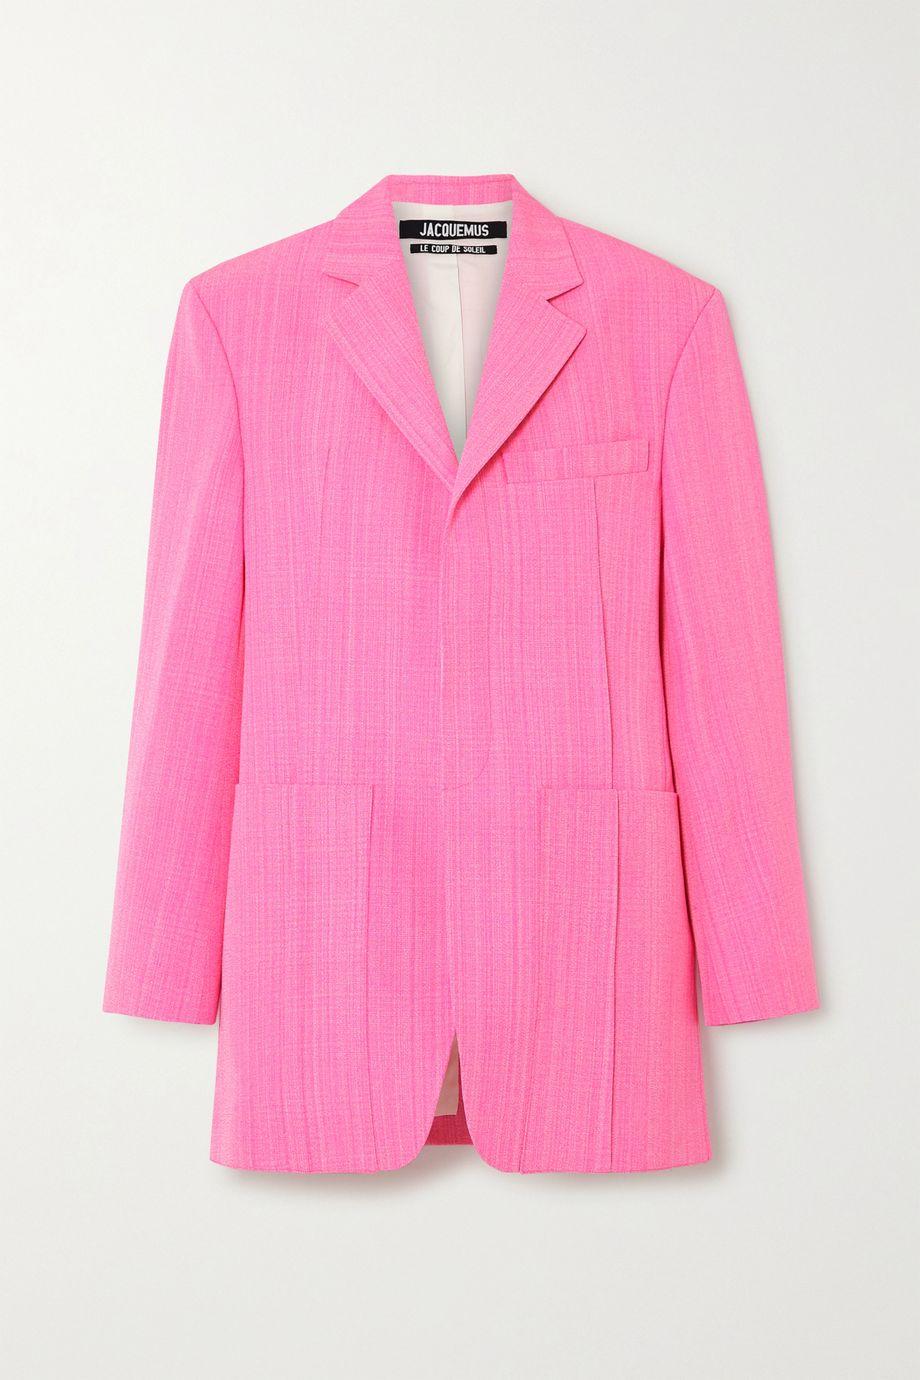 Jacquemus Oversized woven blazer